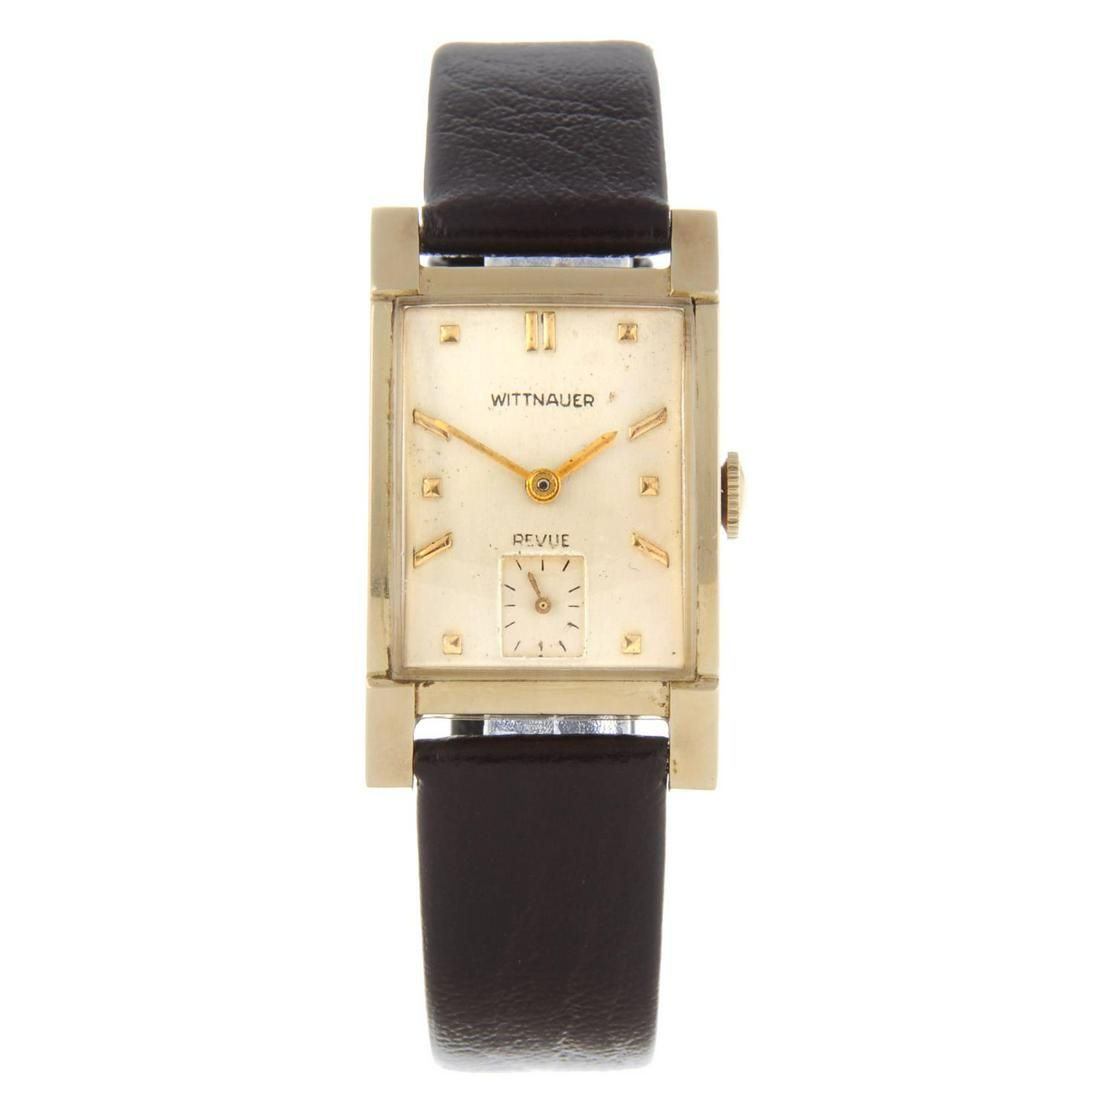 WITTNAUER - a Revue wrist watch. Yellow metal case,